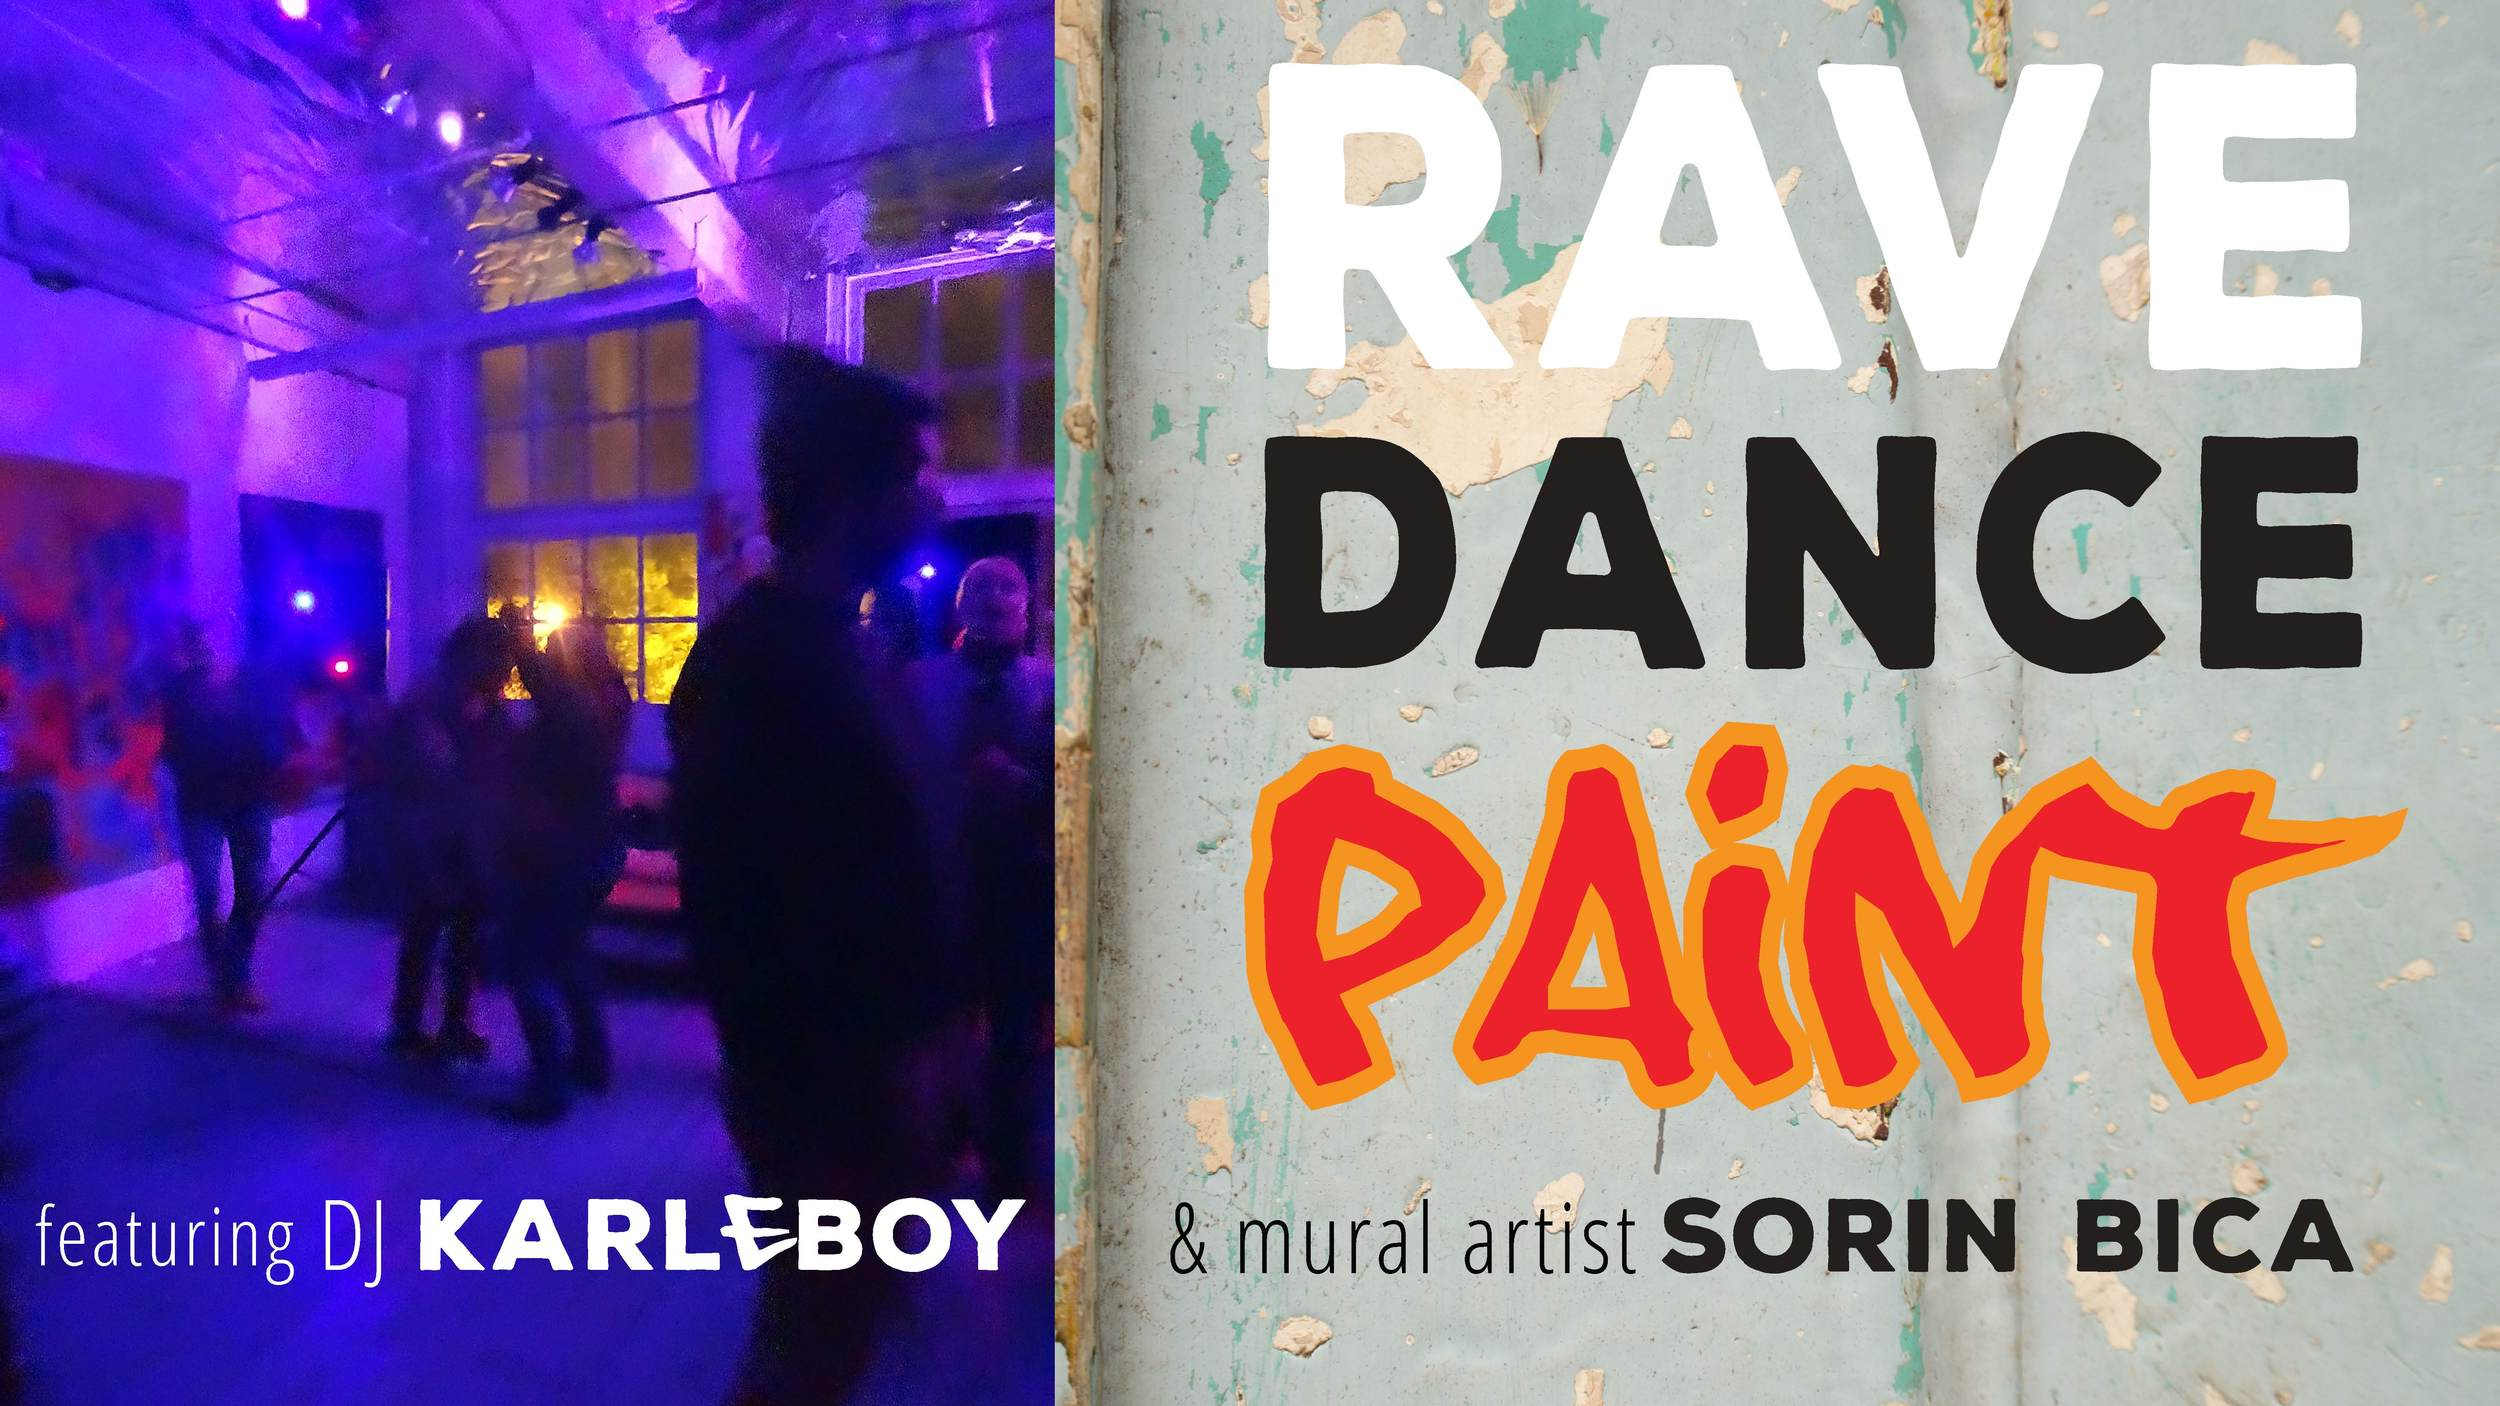 Photos taken at Dj Karleboy party in Sorin Bica's studio Summer 2015.